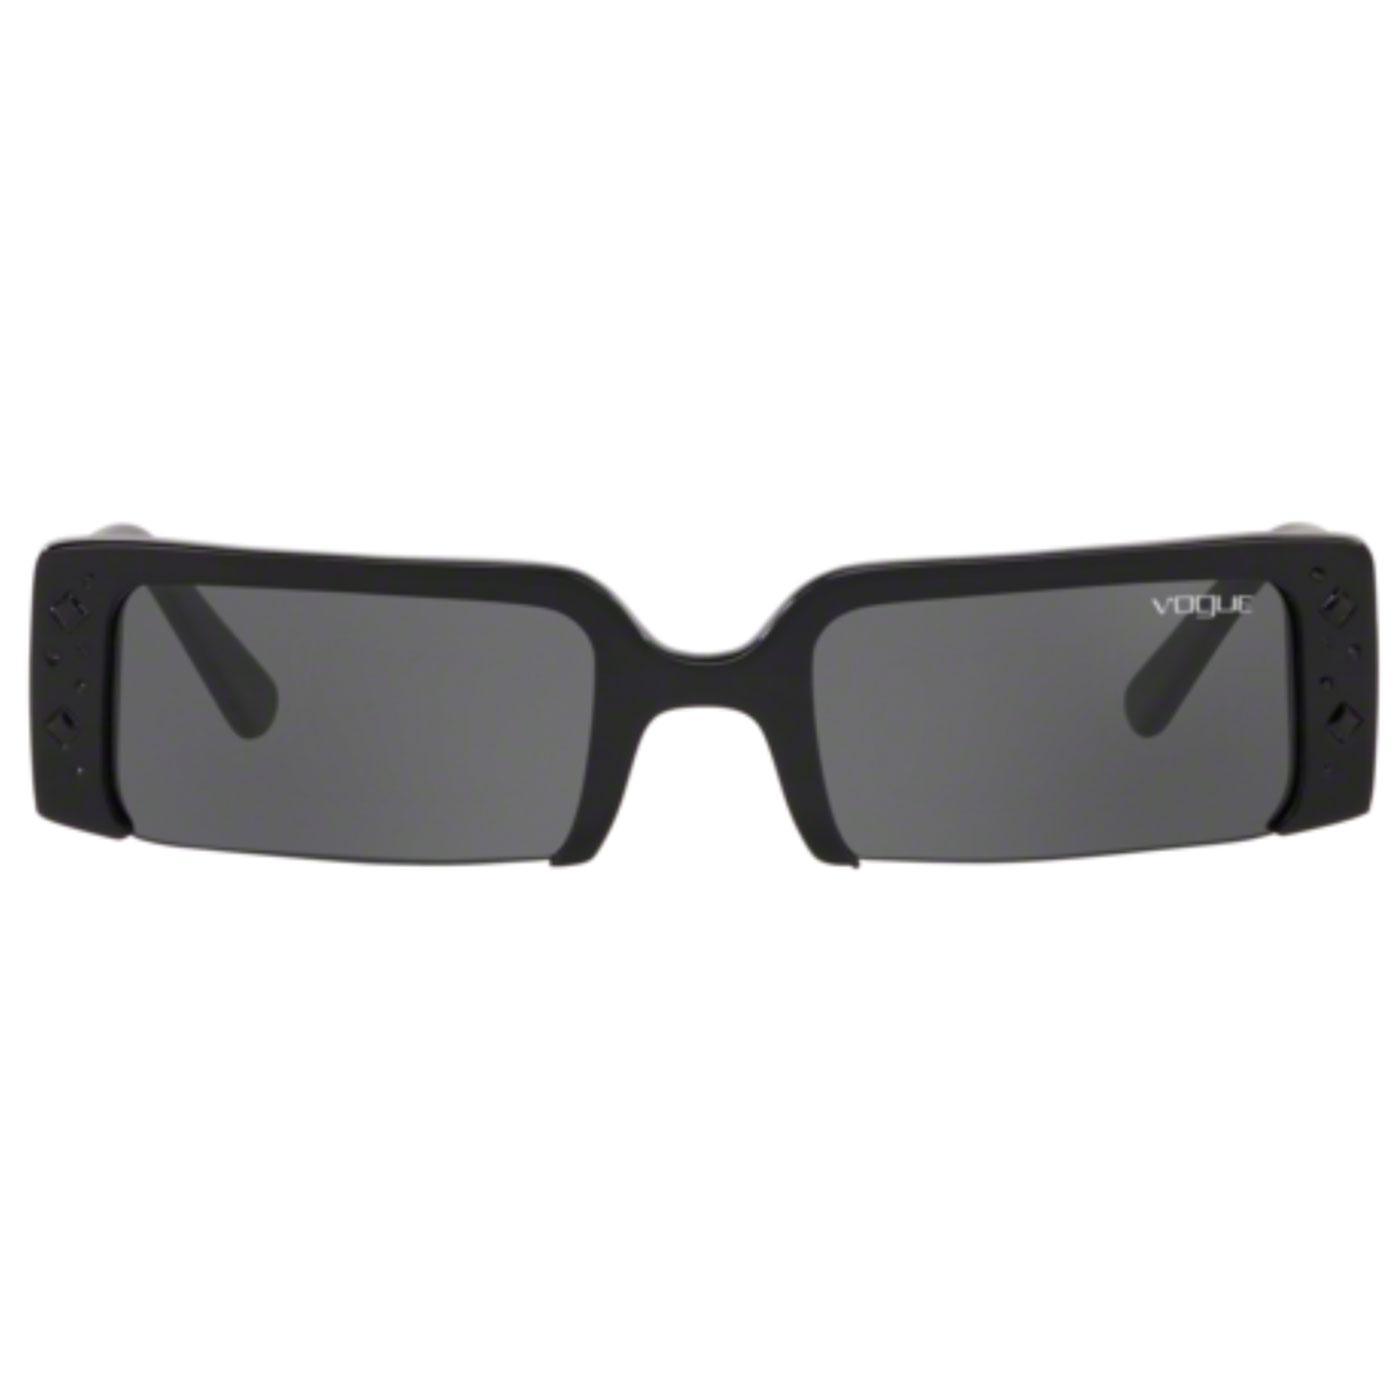 Soho VOGUE x GIGI HADID Retro Square Sunglasses B